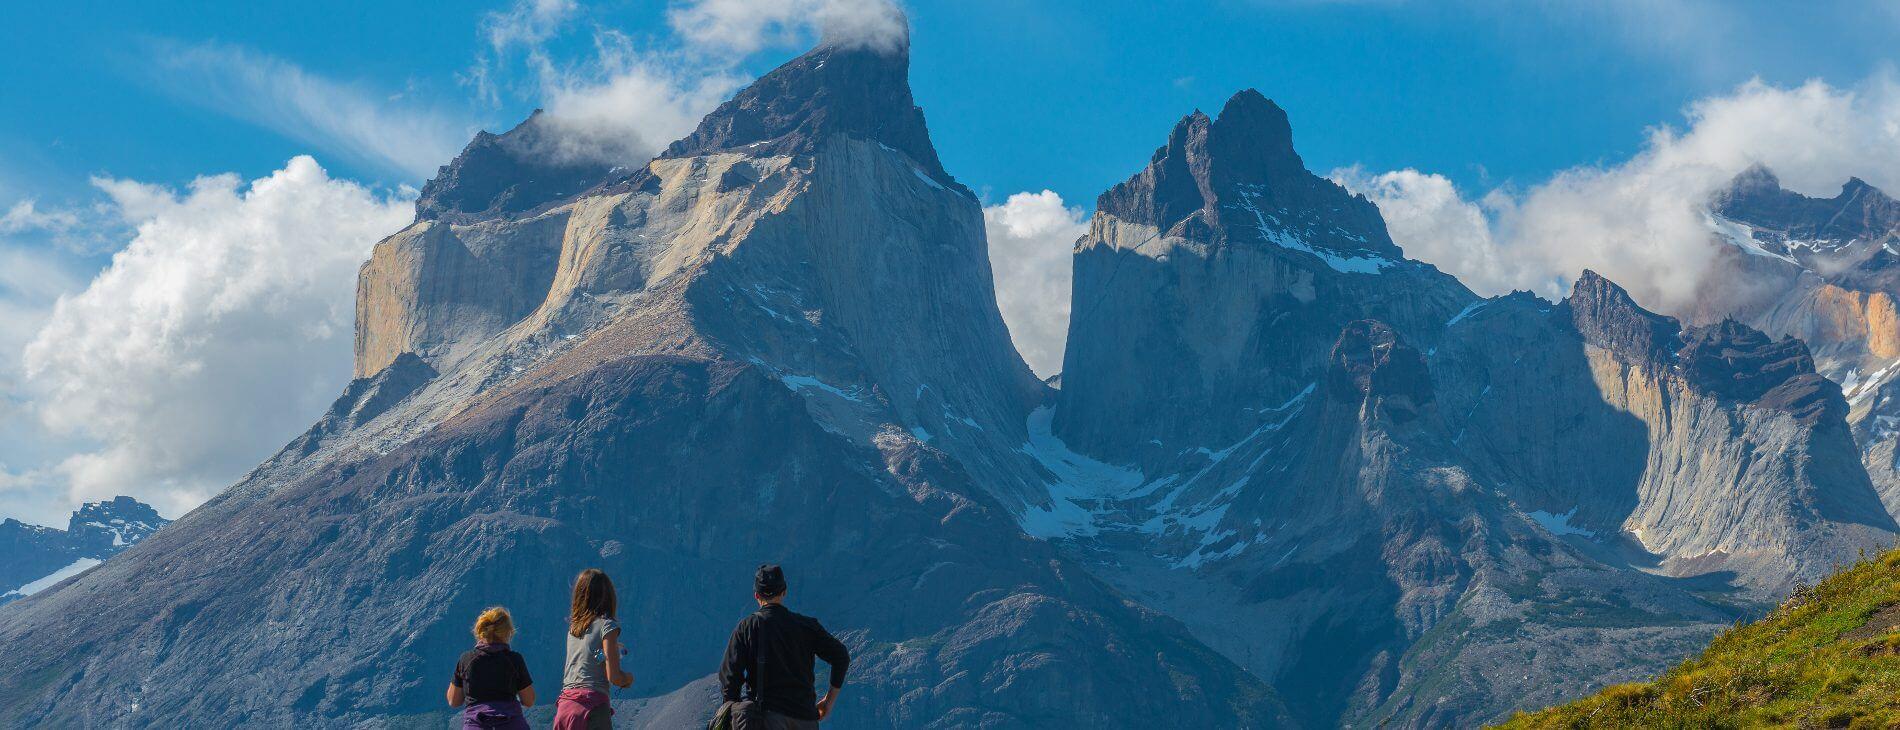 Mastroviaggiatore Patagonia Easy Trekking